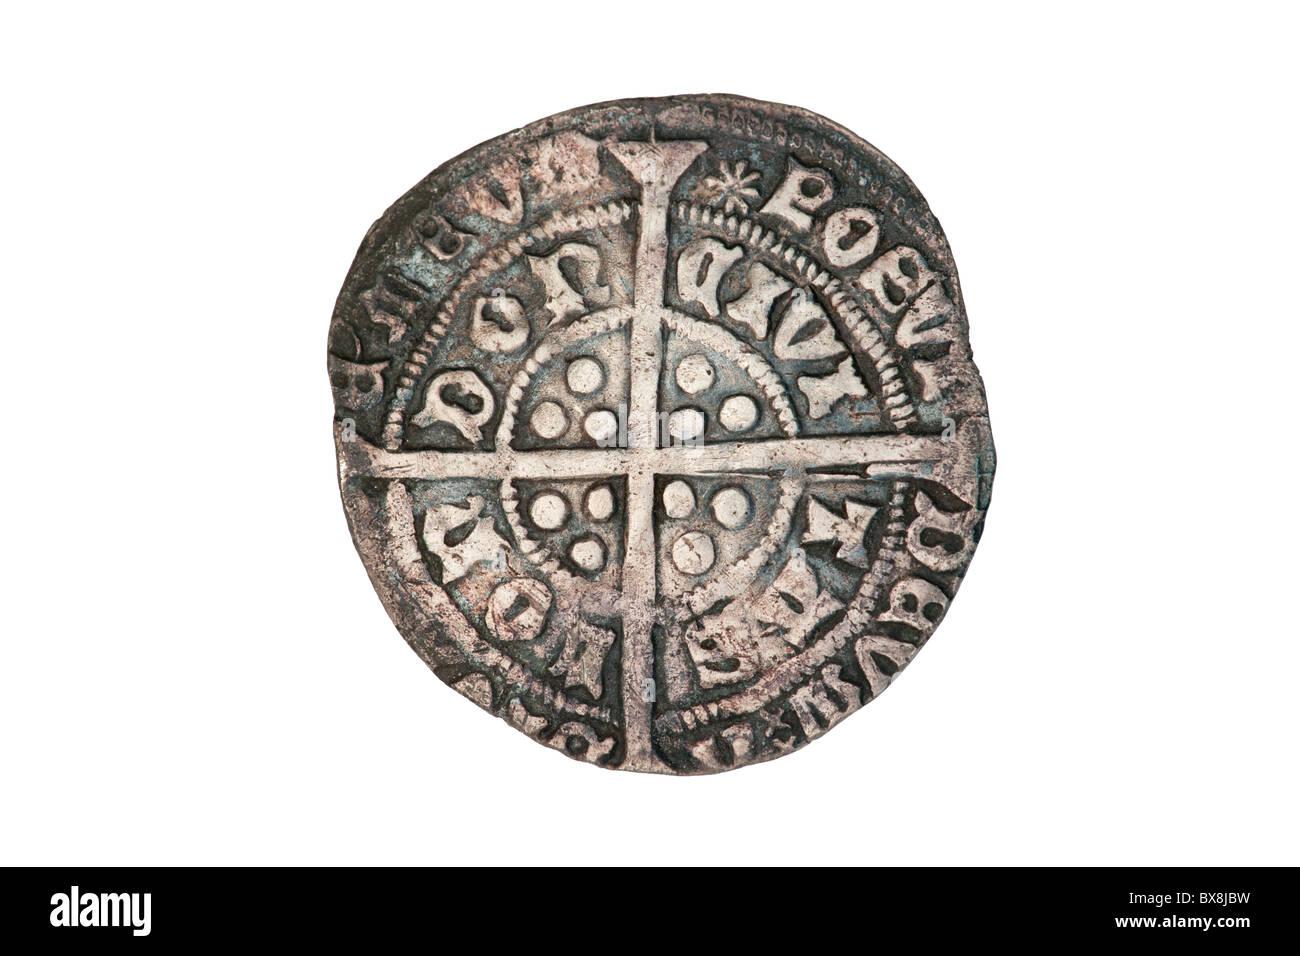 Silver groat of King Edward - reverse - Stock Image